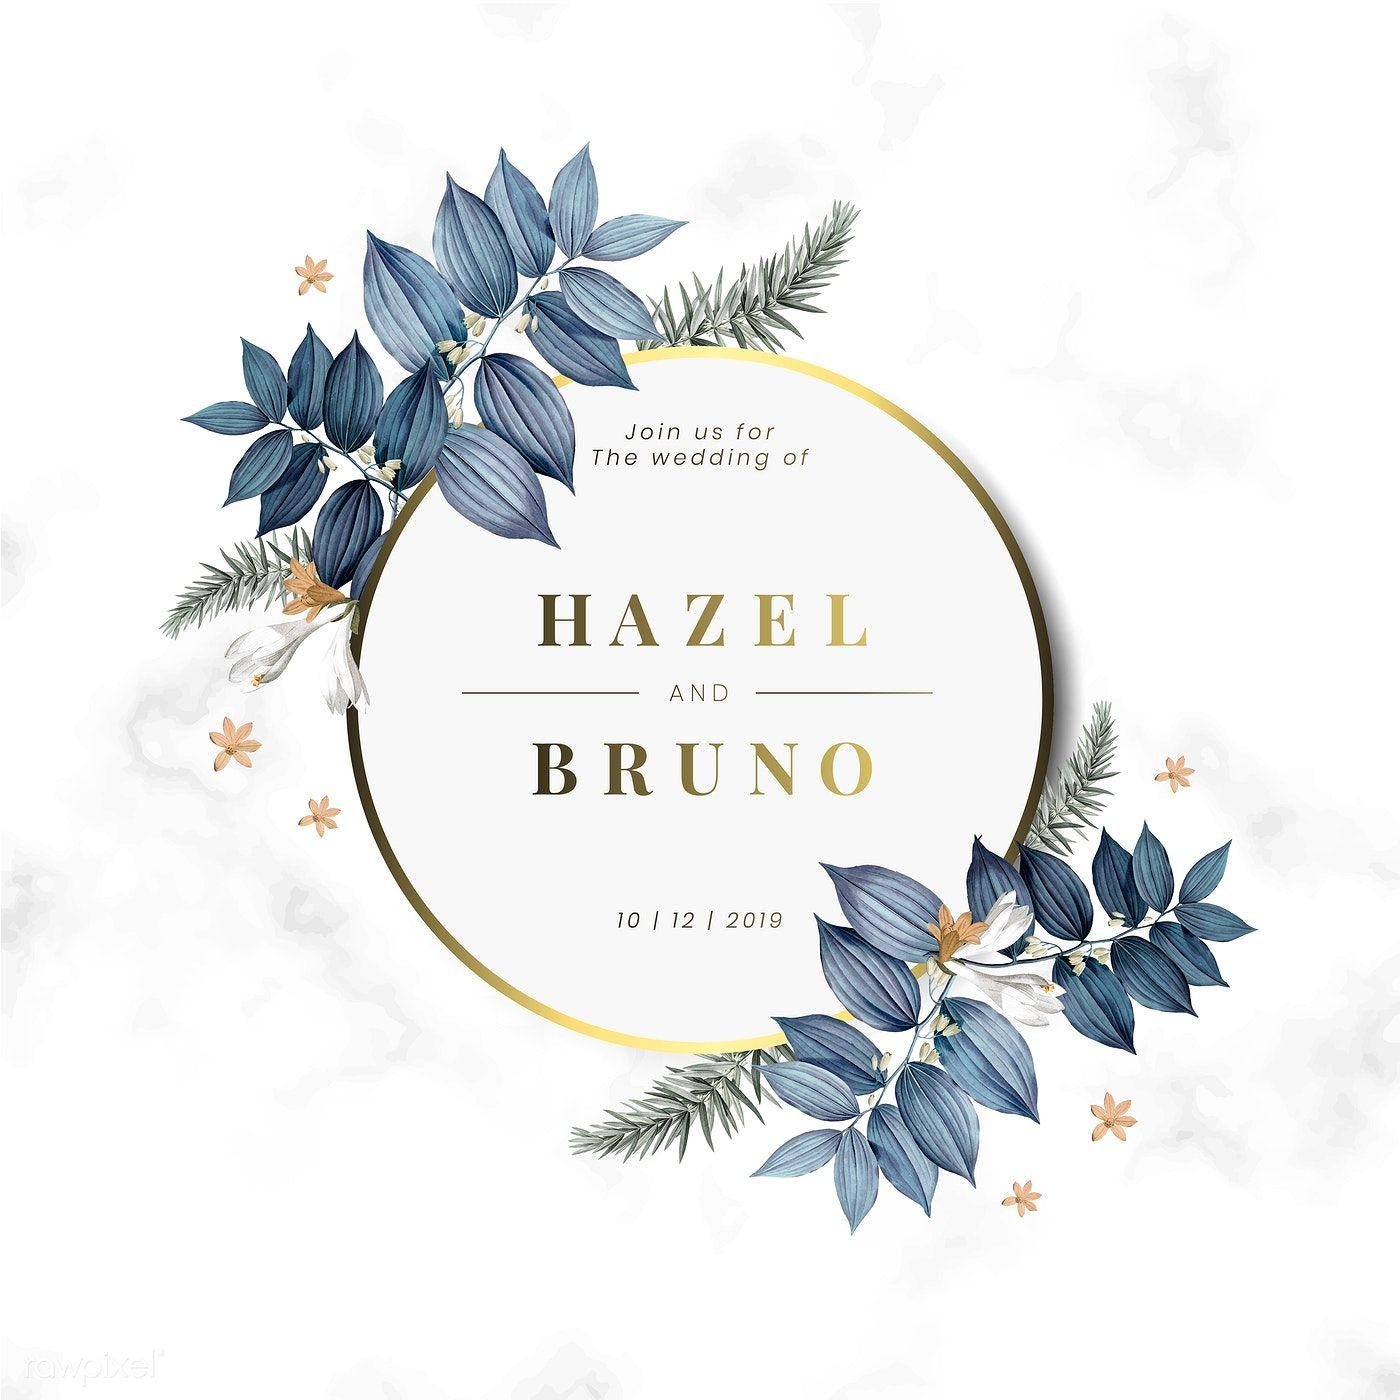 Download premium vector of Floral wedding invitation card design